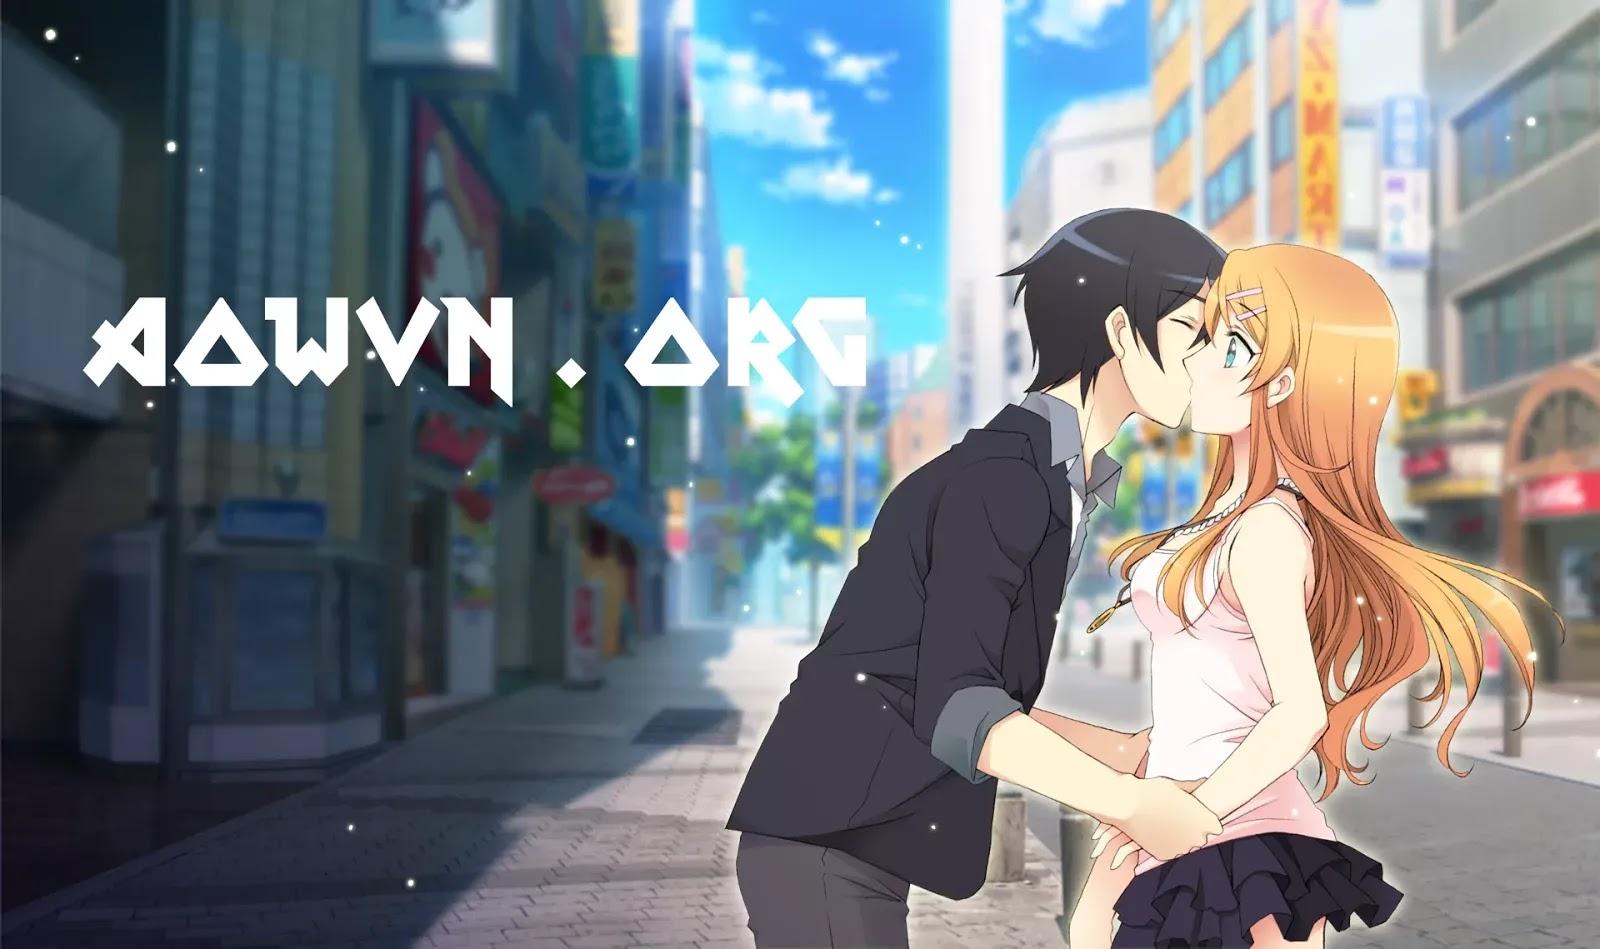 AowVN.org min%2B%25282%2529 - [ Anime 3gp Mp4 ] Ore No Imouto Ga Konna Ni Kawaii Wake Ga Nai BD SS1 + SS2 + Specials | Vietsub - Tình Cảm Đời Thường Hay